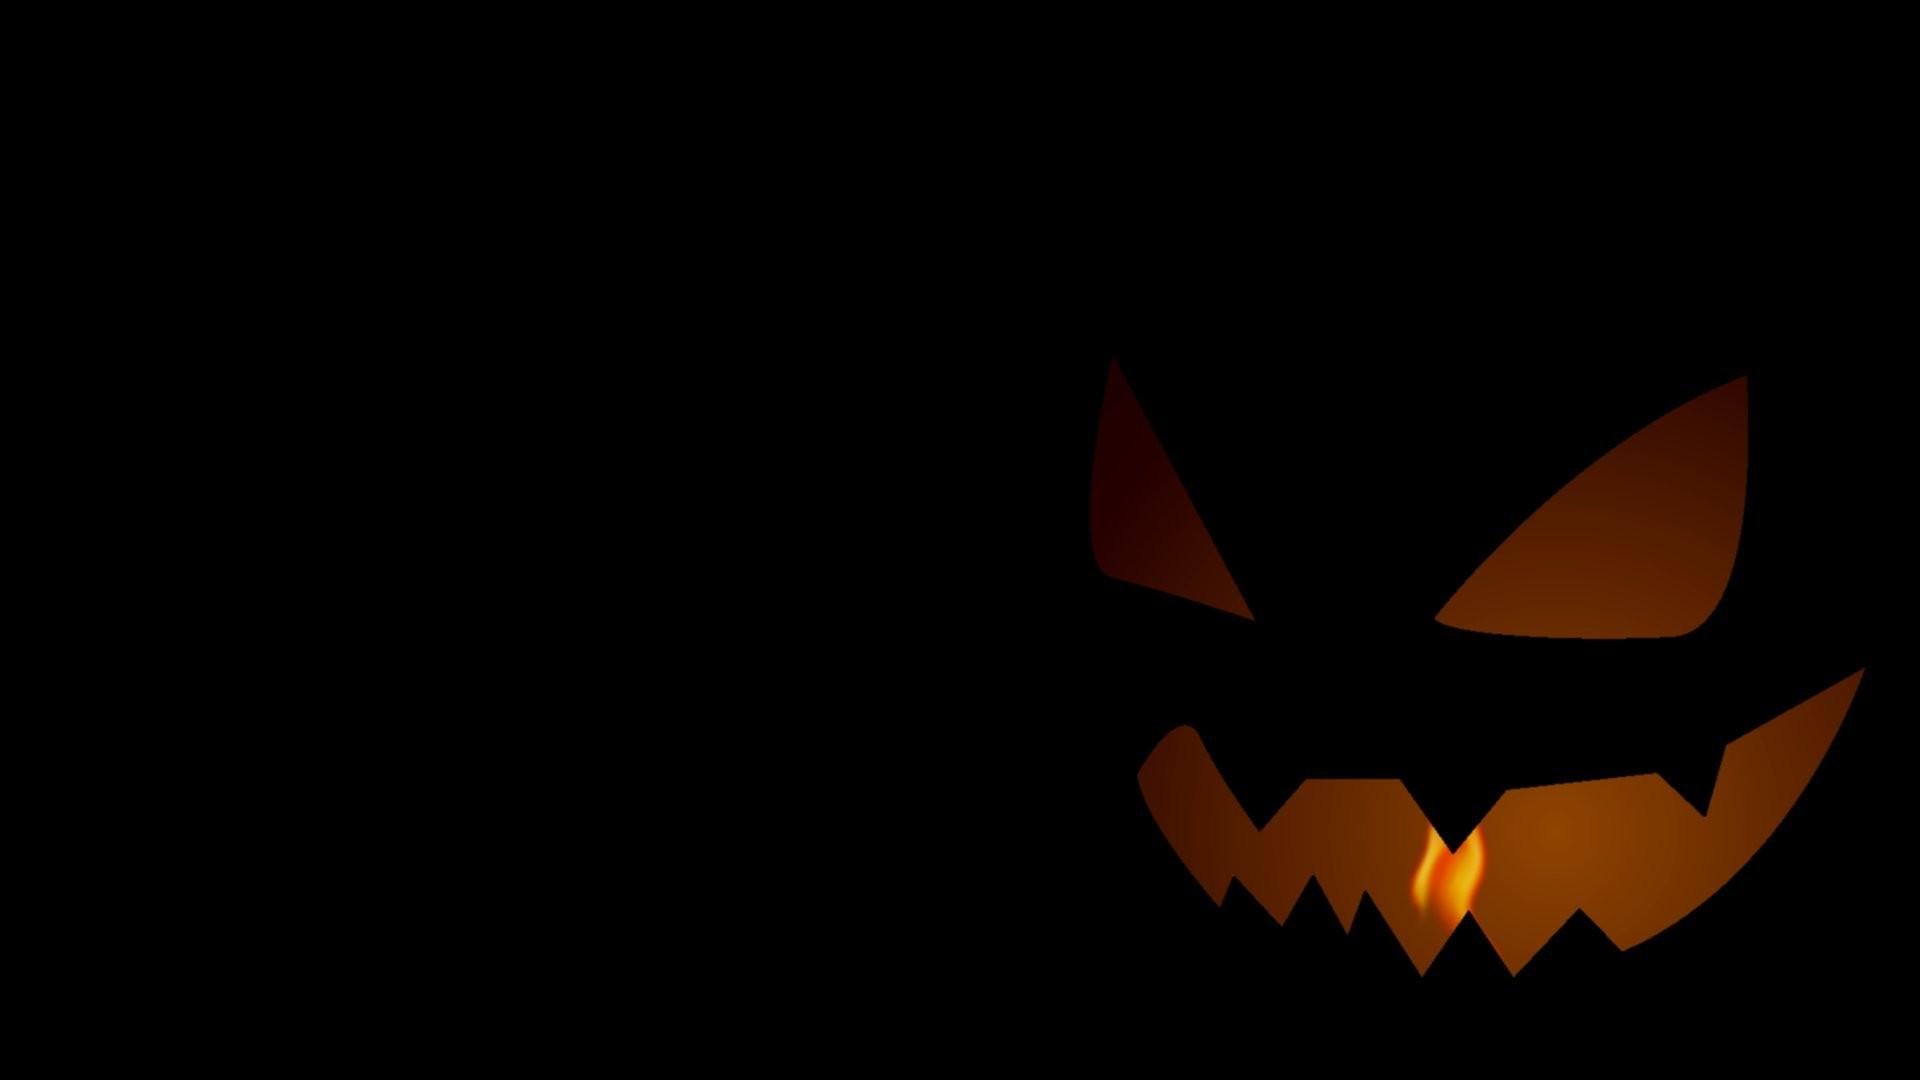 Halloween Background Animated